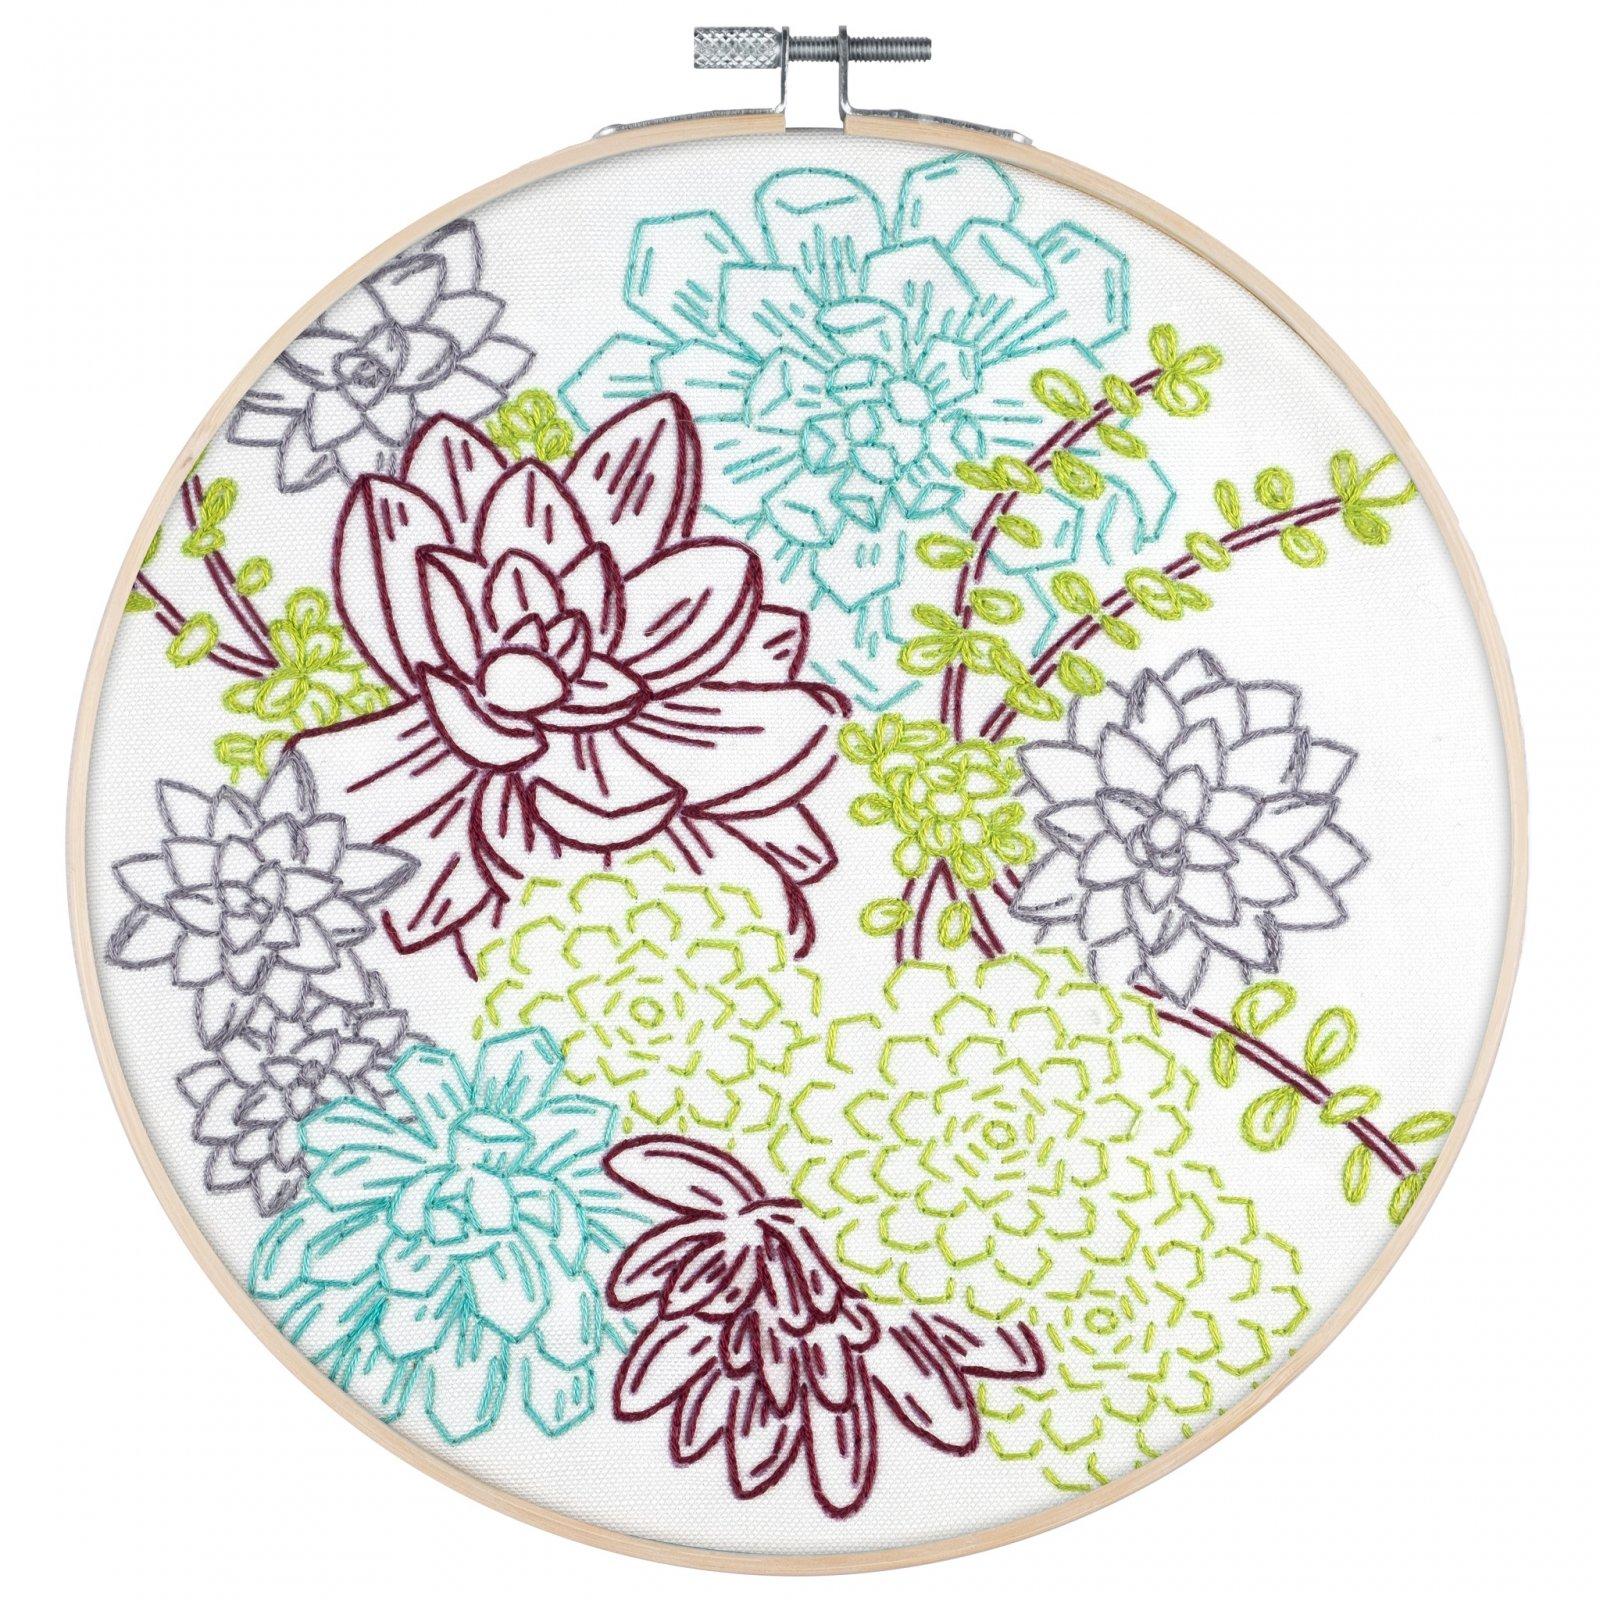 PopLush Embroidery Kit 8 - Succulent Garden